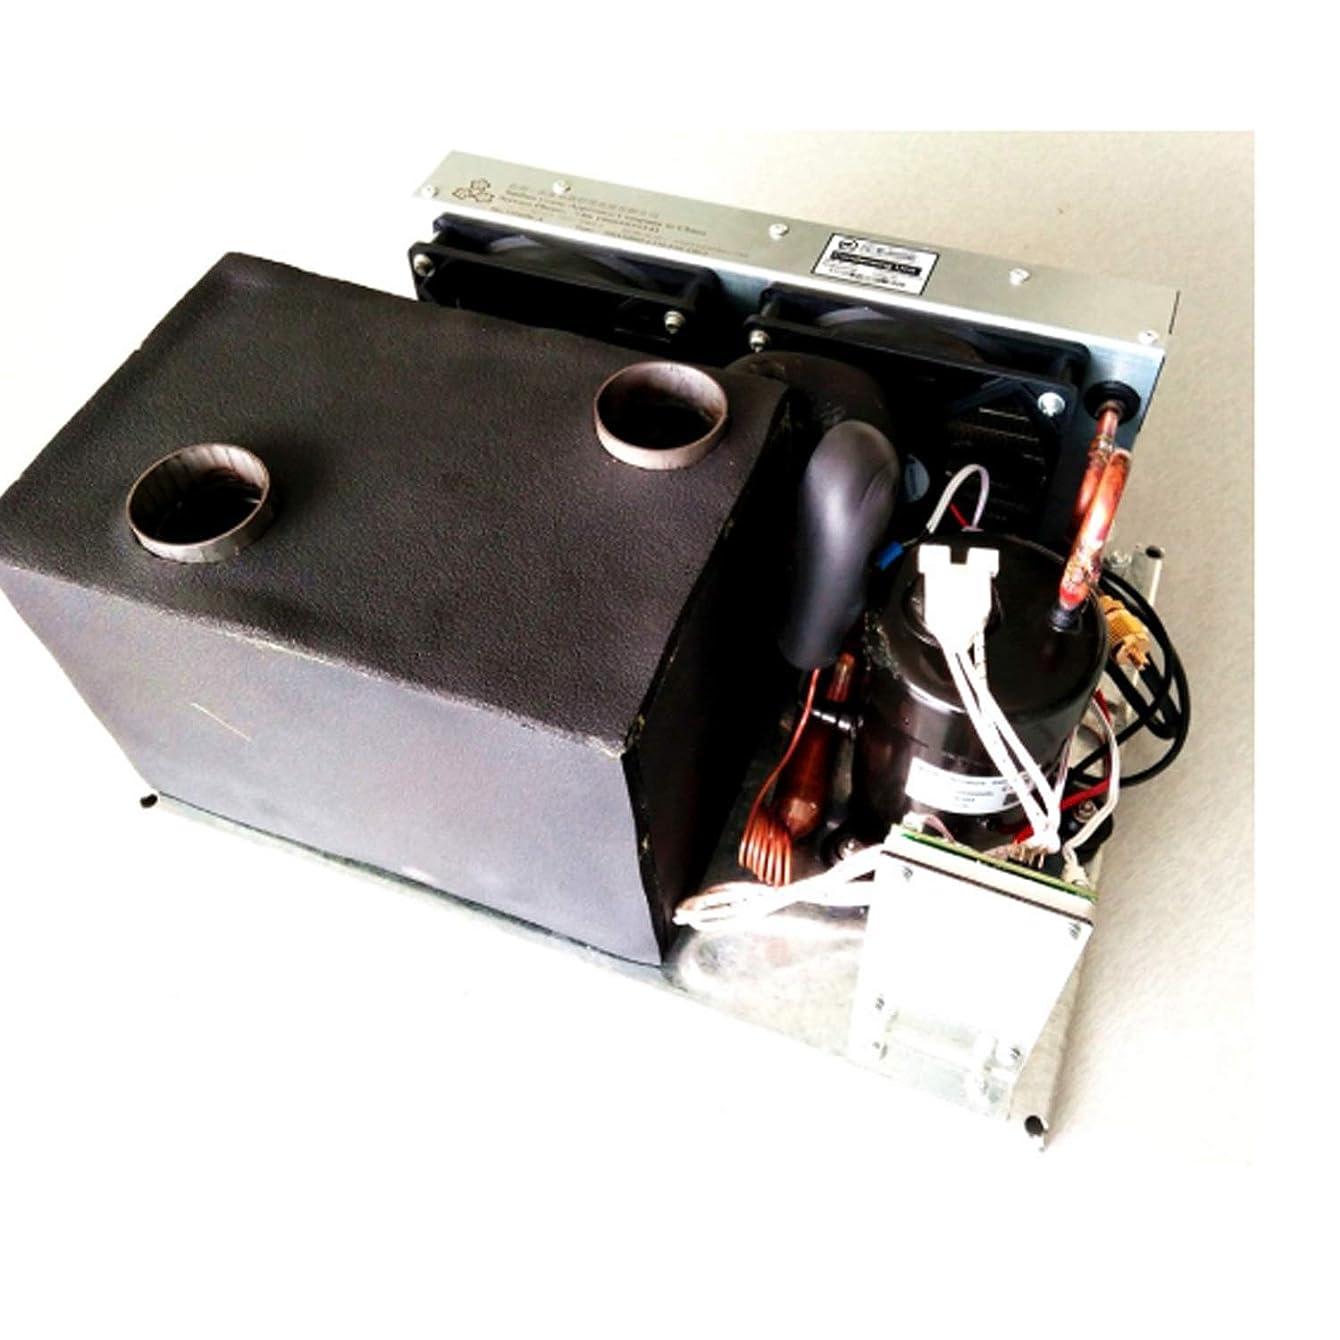 Micro Micro air conditioner Micro DC Aircon, DC 24V 650W with R134A Refrigerant,Micro Refrigeration Powerful Micro air conditioner For Car,Micro air conditioner Cooling System DC Micro air conditioner